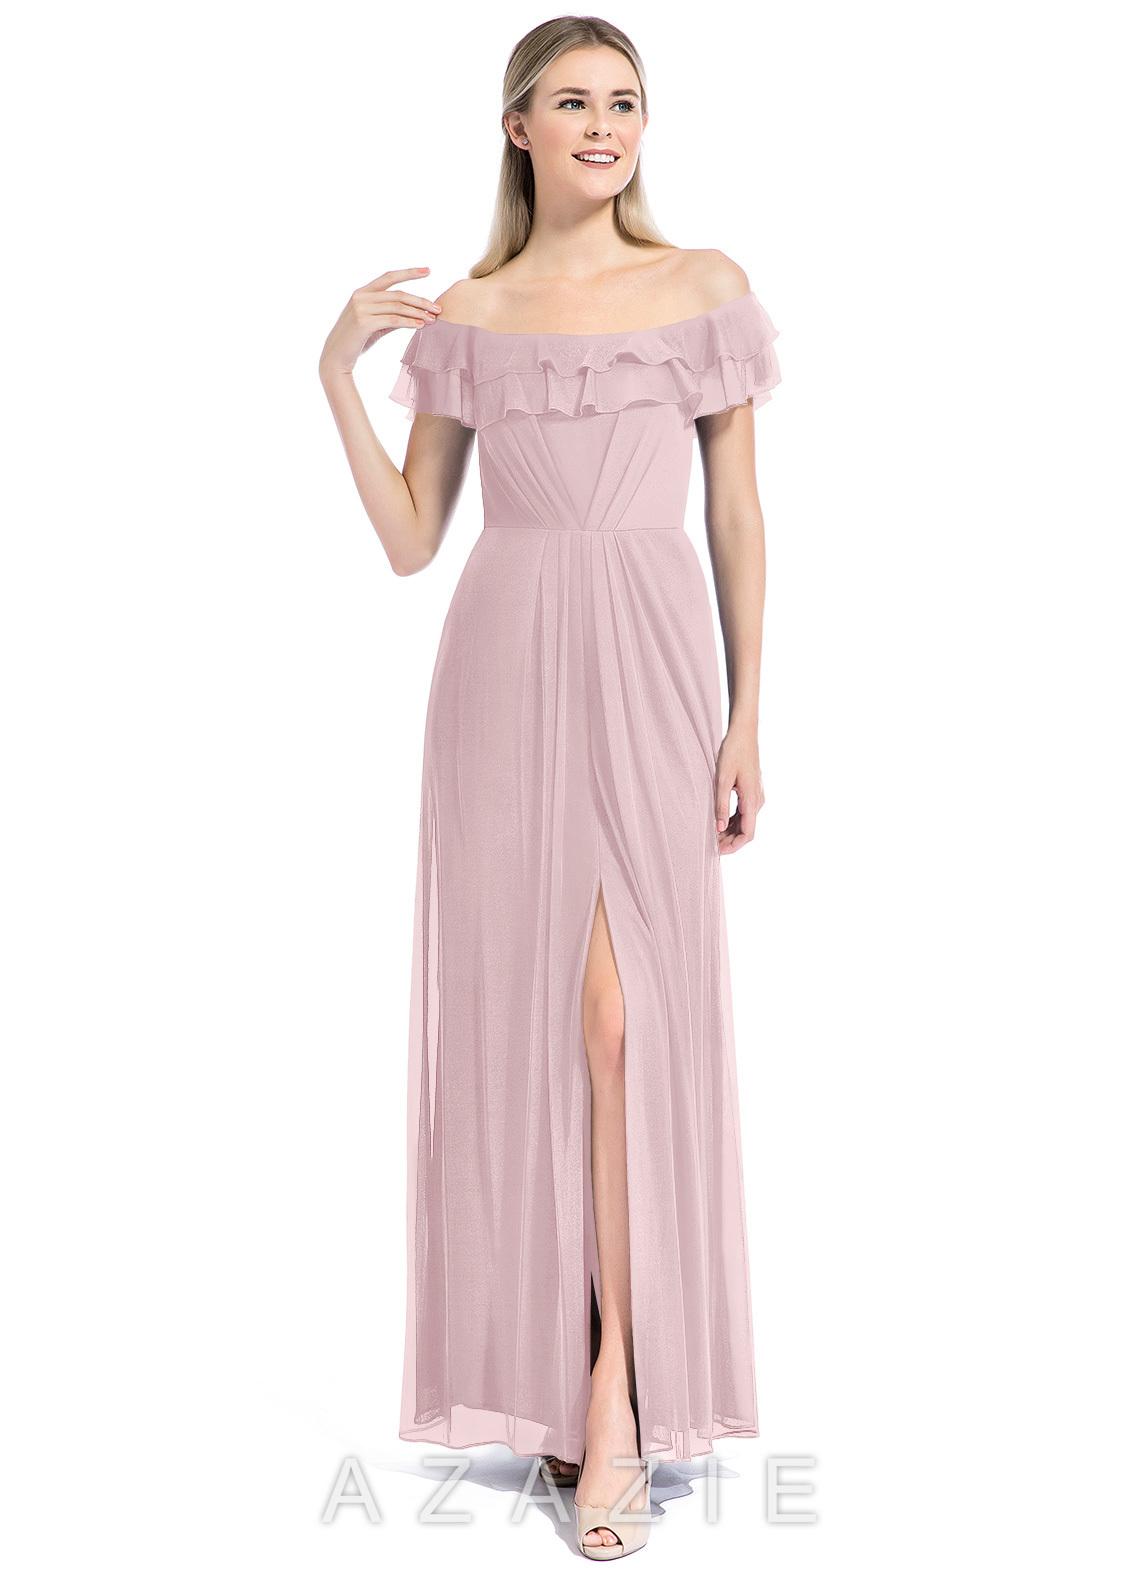 02257dab62e Azazie Mia Bridesmaid Dress